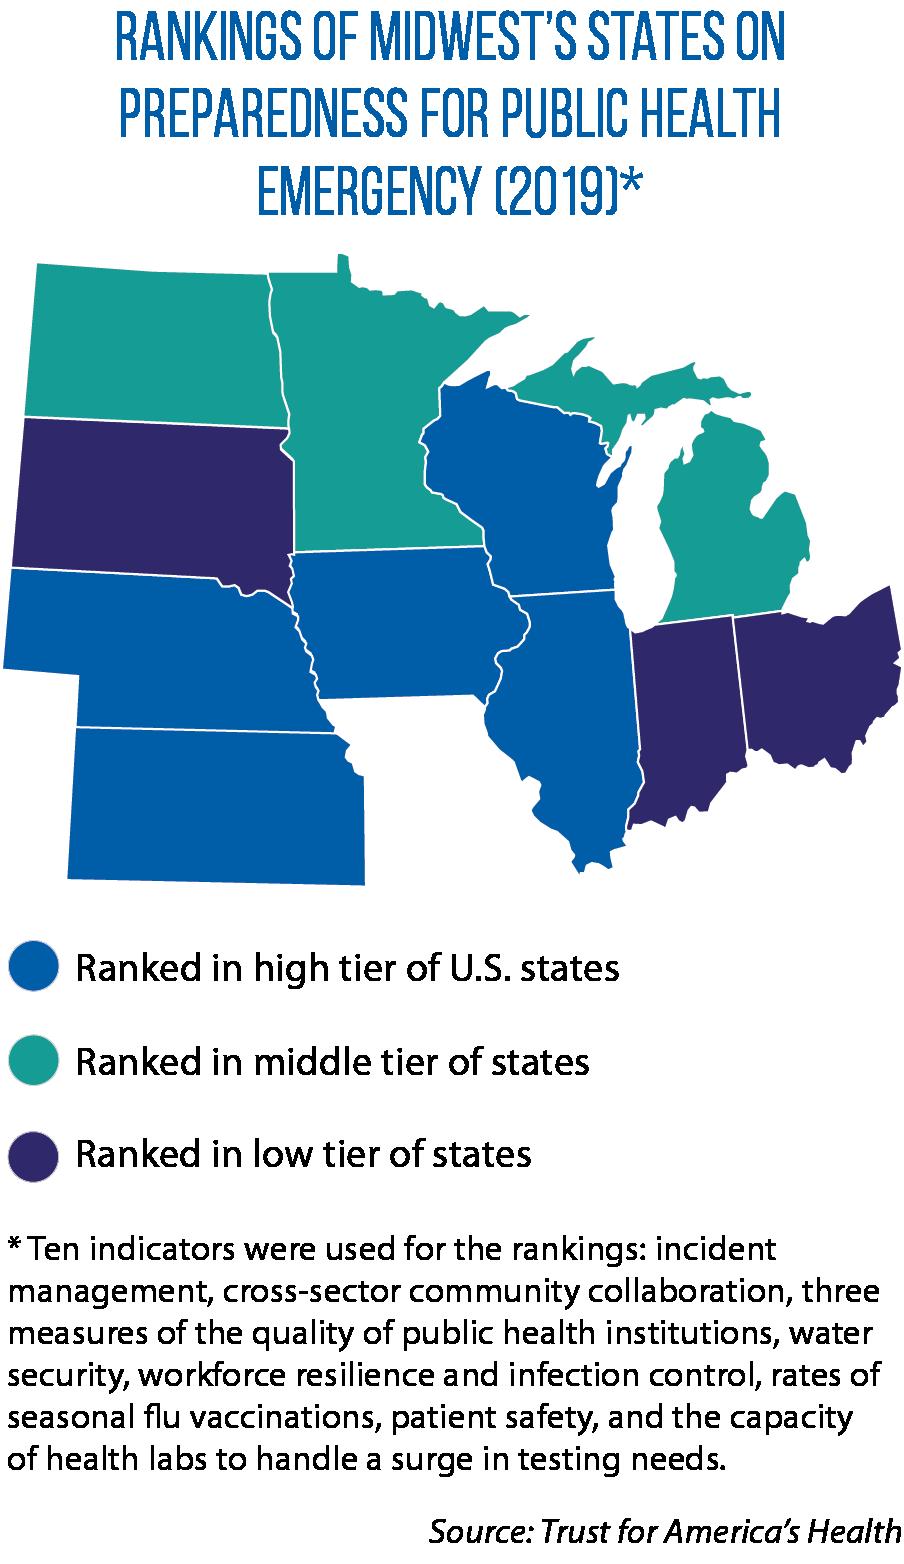 Map of Midwestern states' public health emergency preparedness rankings